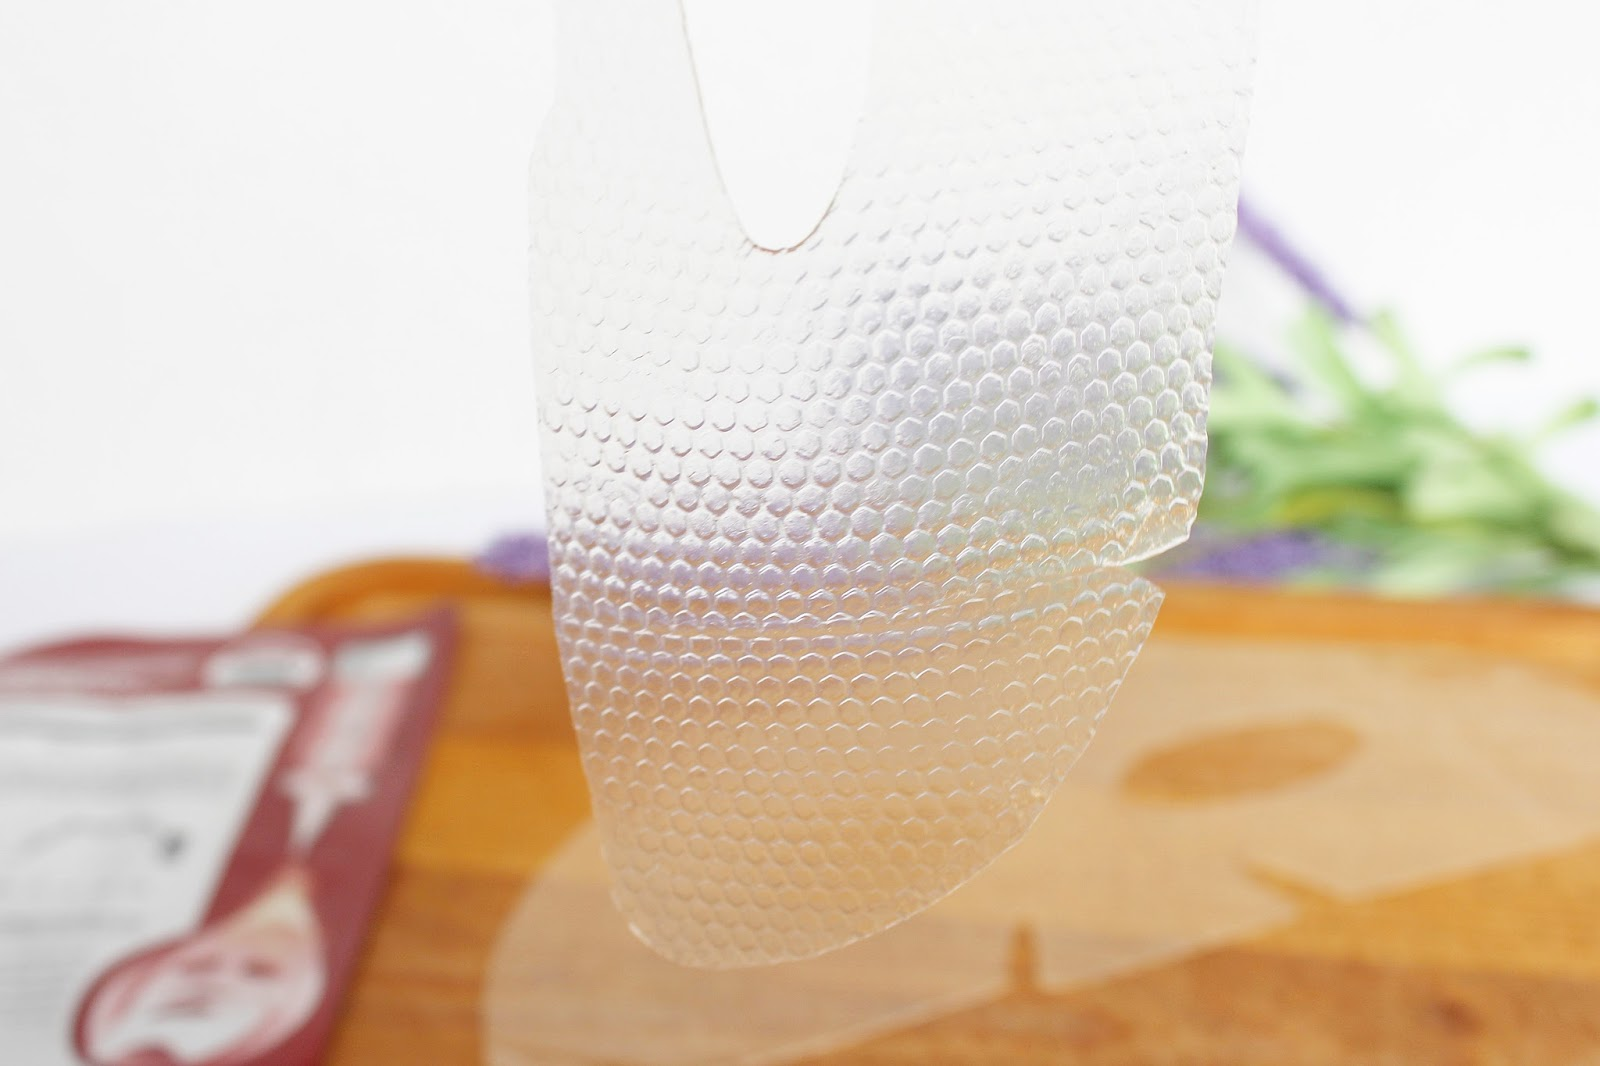 Swanicoco, Overnight Intensive Recharging Hydrogel Mask Pack